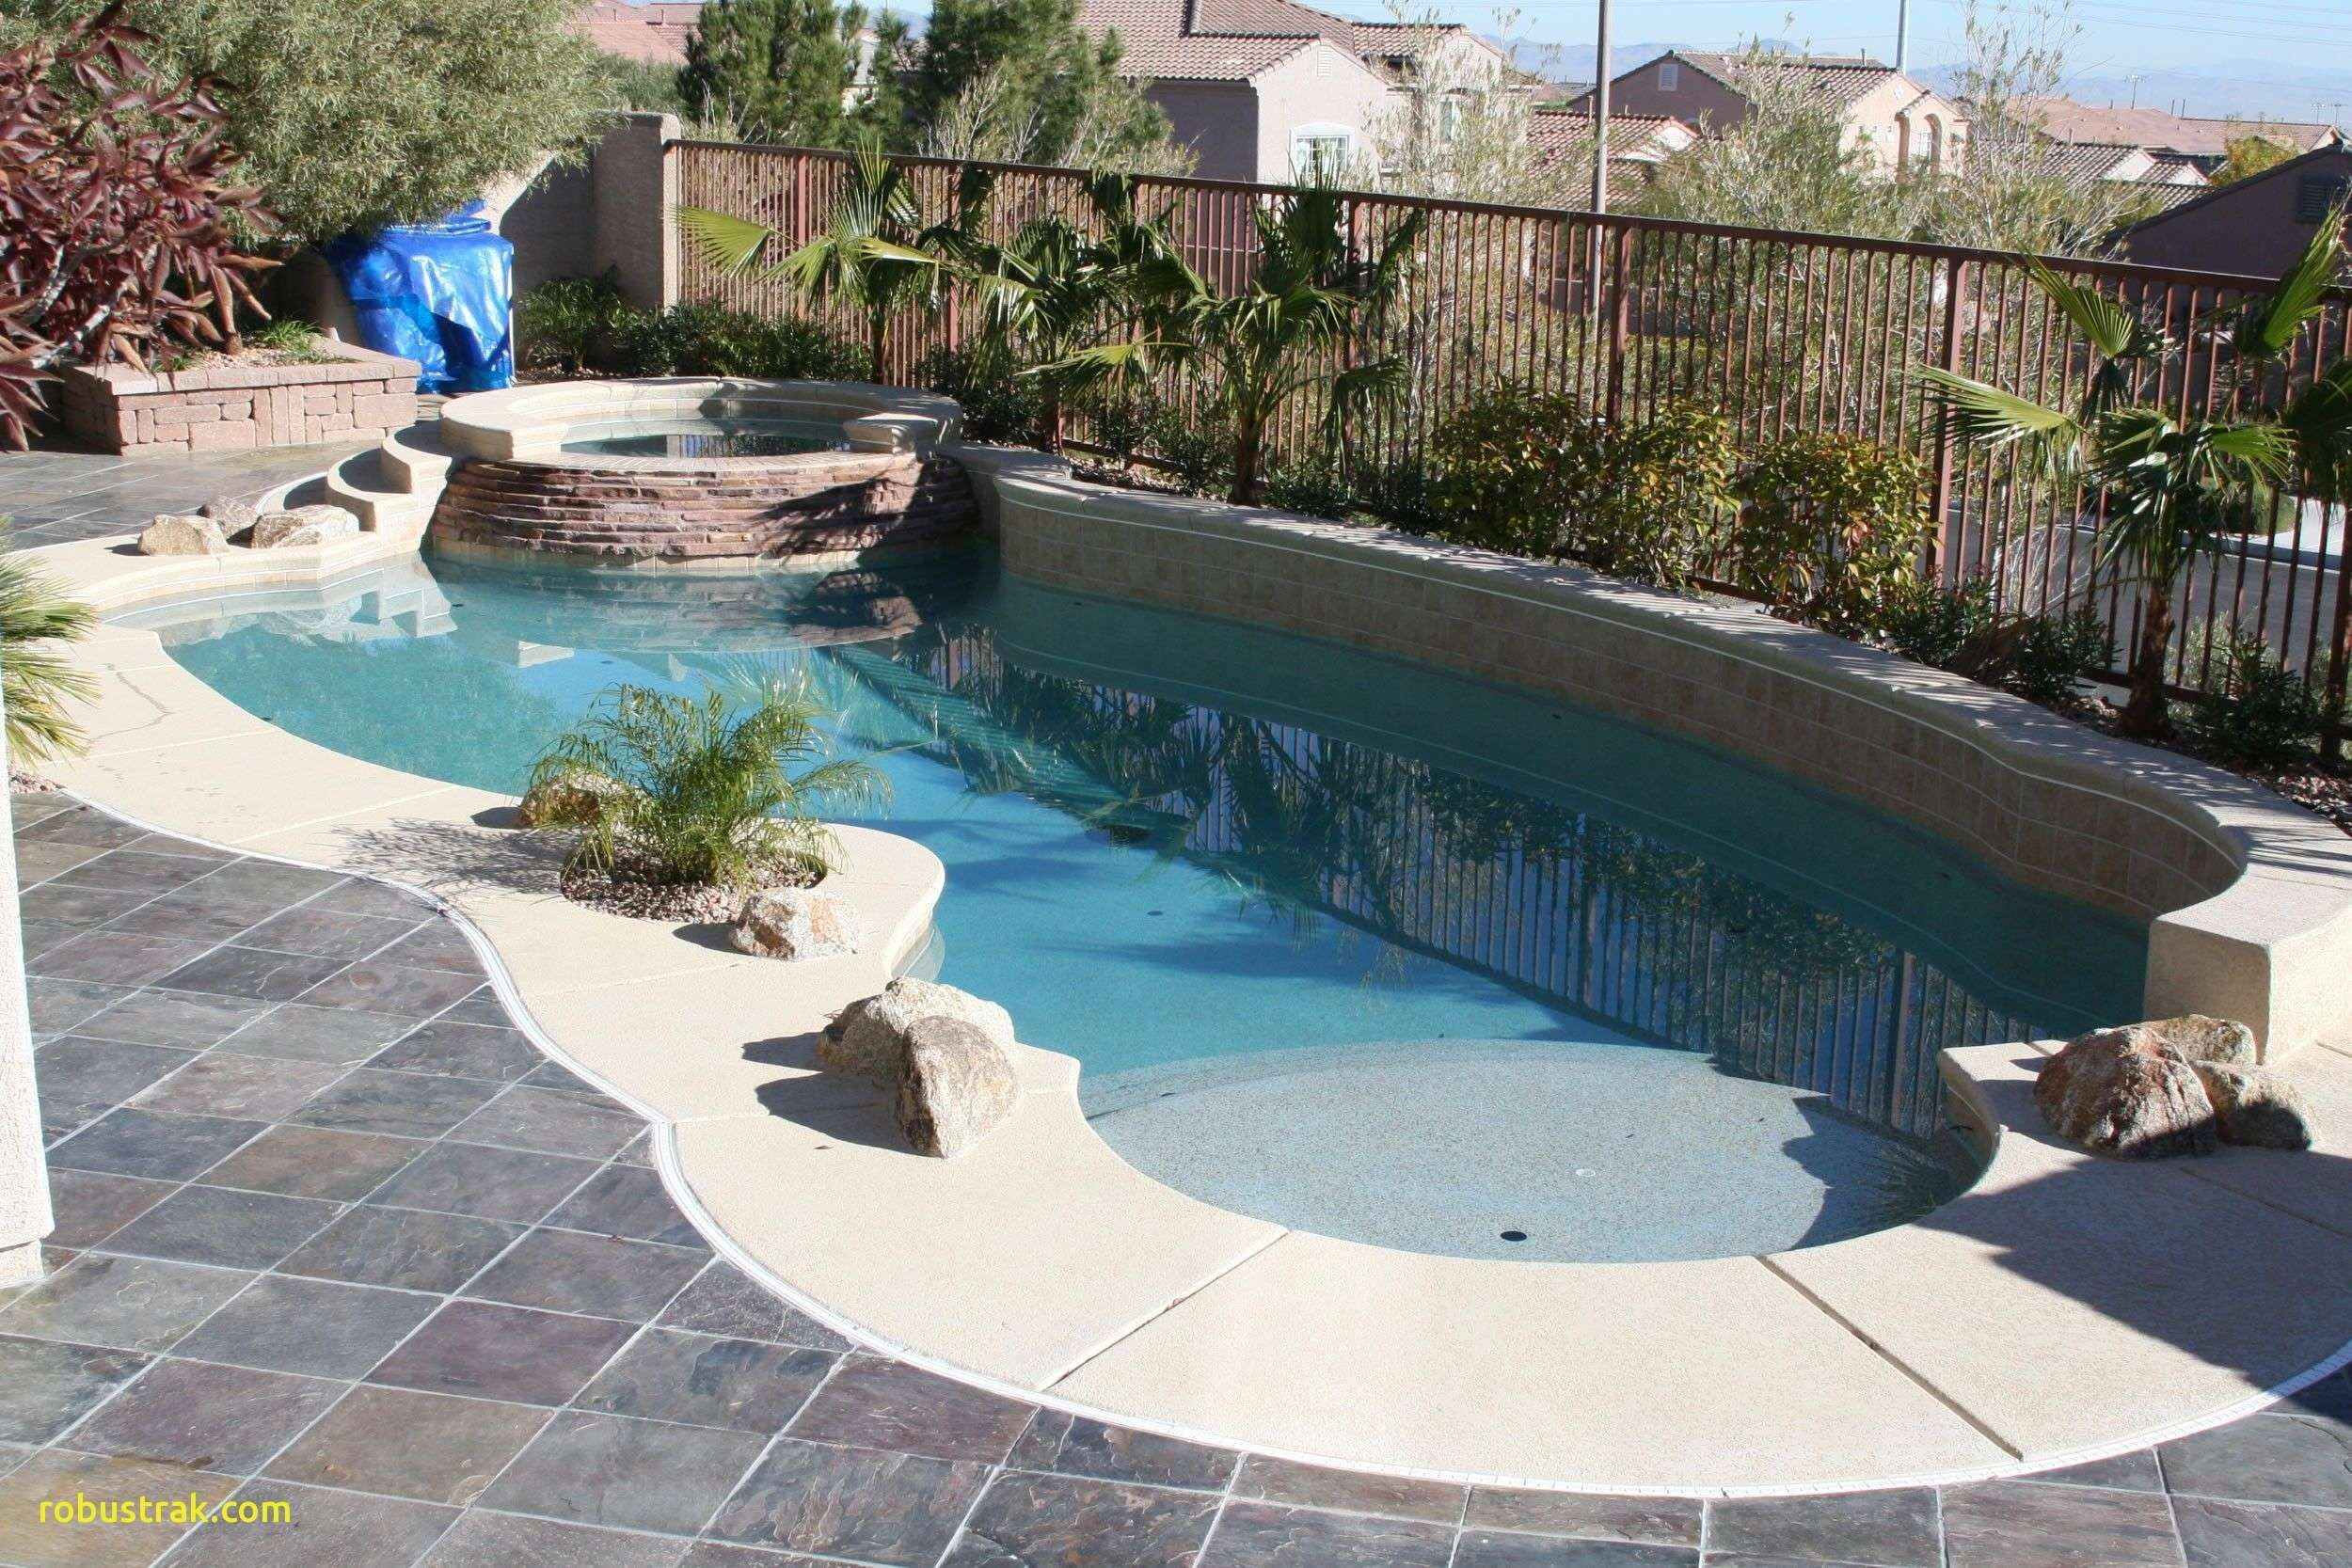 Swimming Pool Sketch Design Architecture Pool Architecture Design Small Backyard Pools Backyard Pool Pool Designs